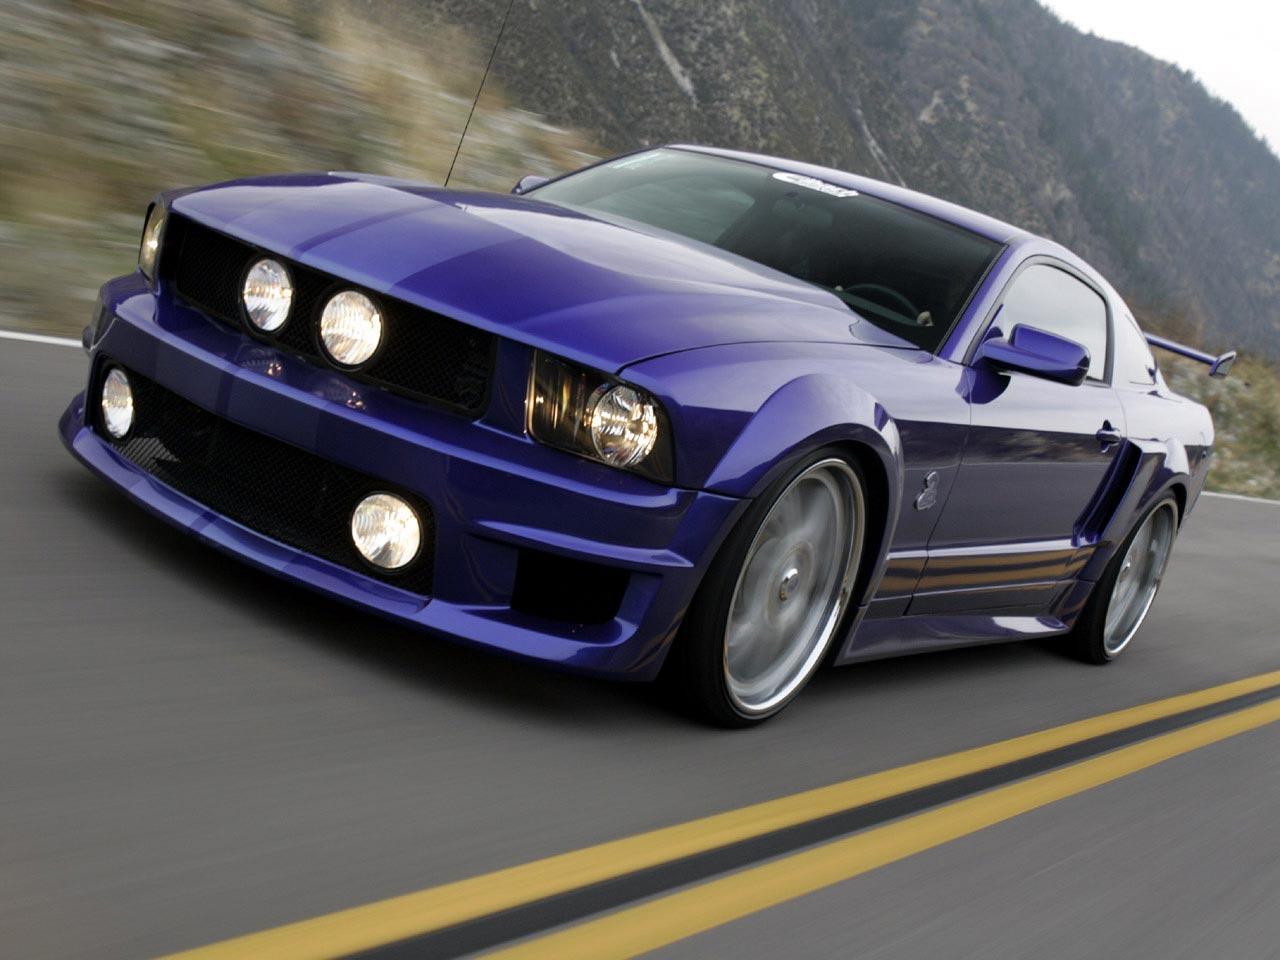 GT Wallpaper   Fond decran Ford Mustang Shelby 1280x960